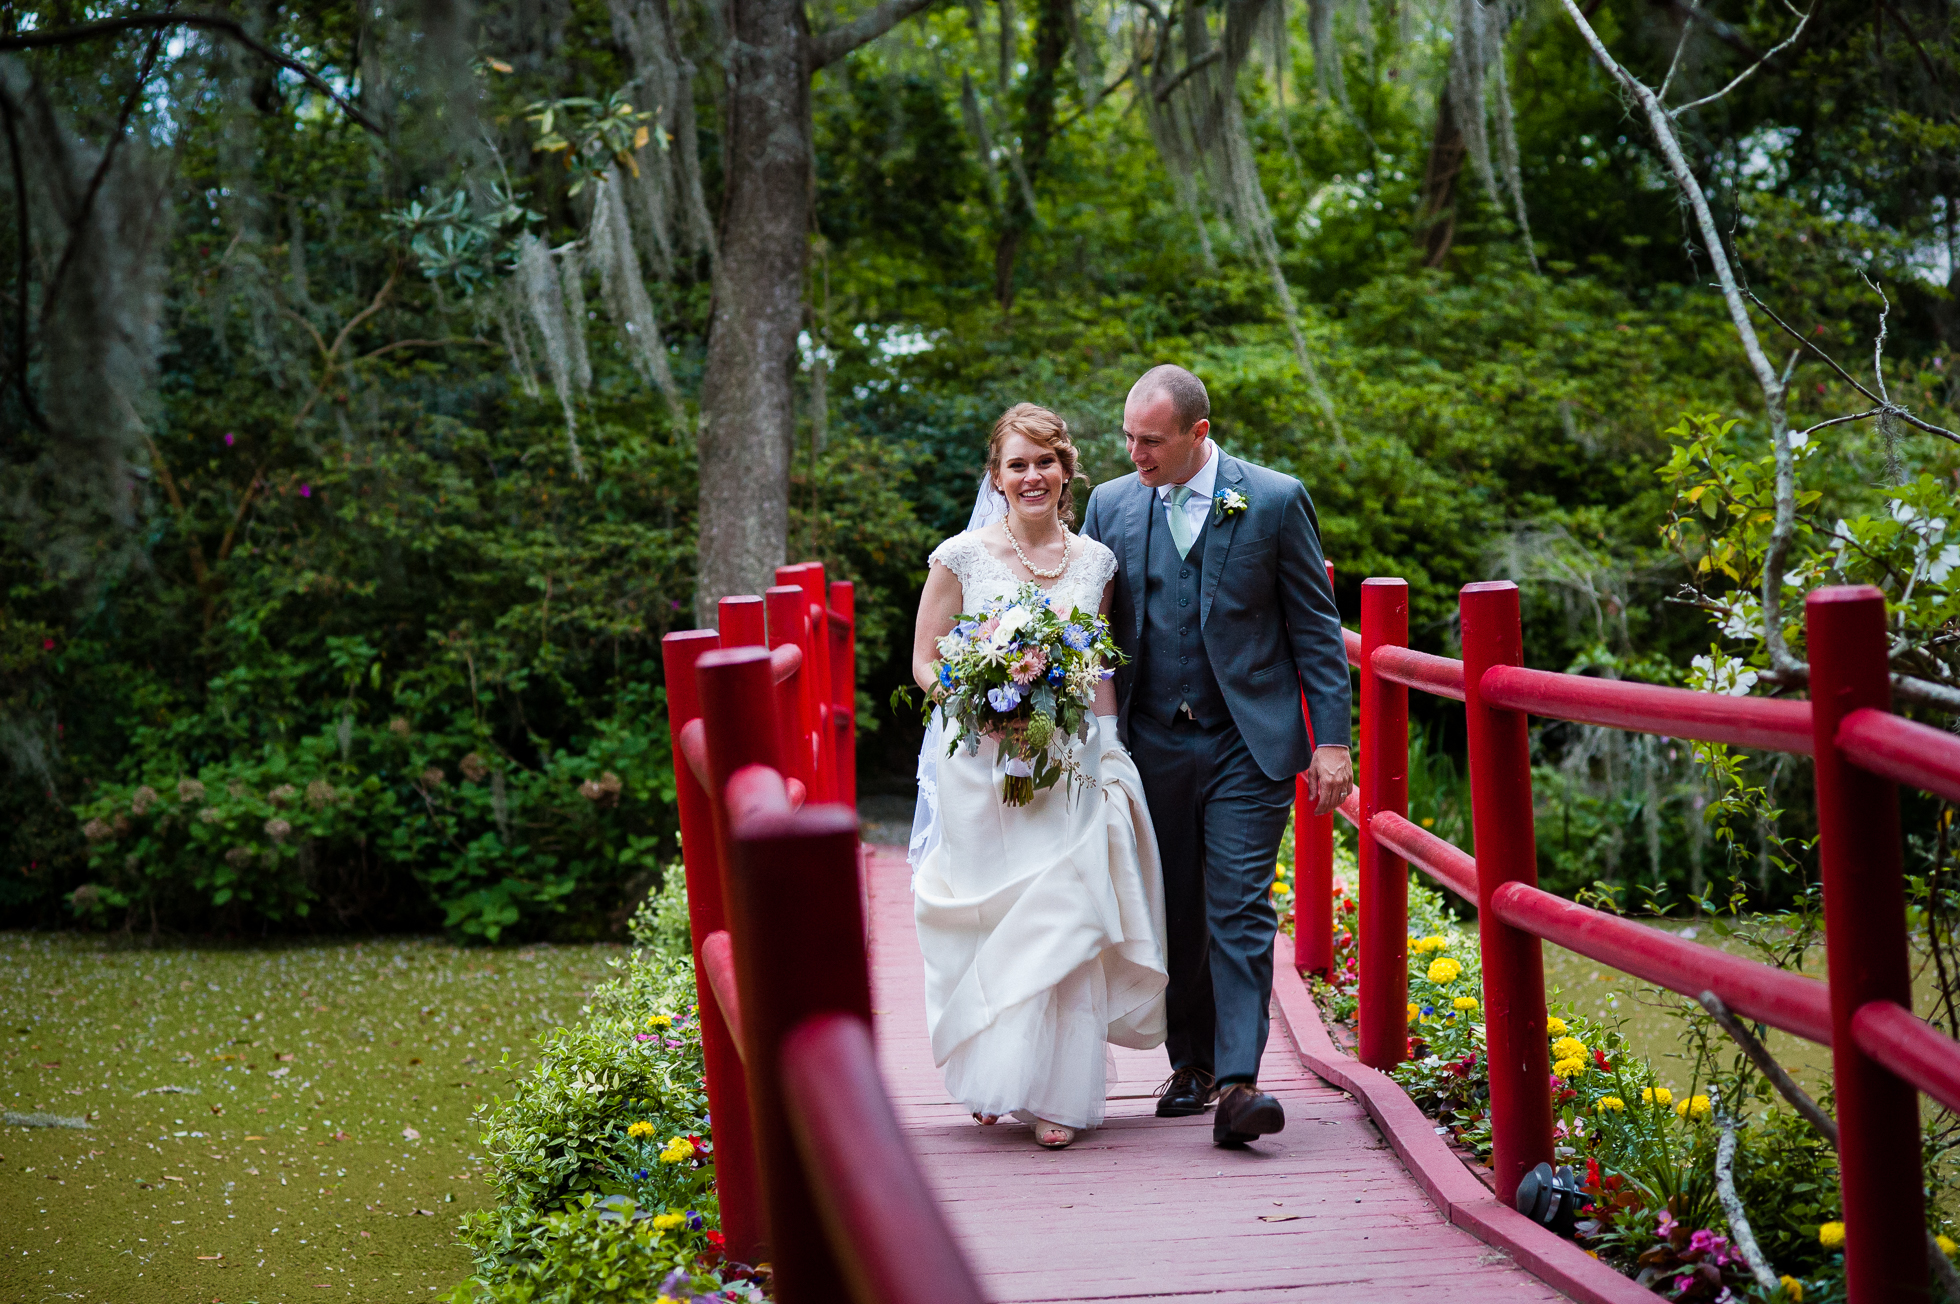 wedding day portrait at Magnolia Plantation in Charleston